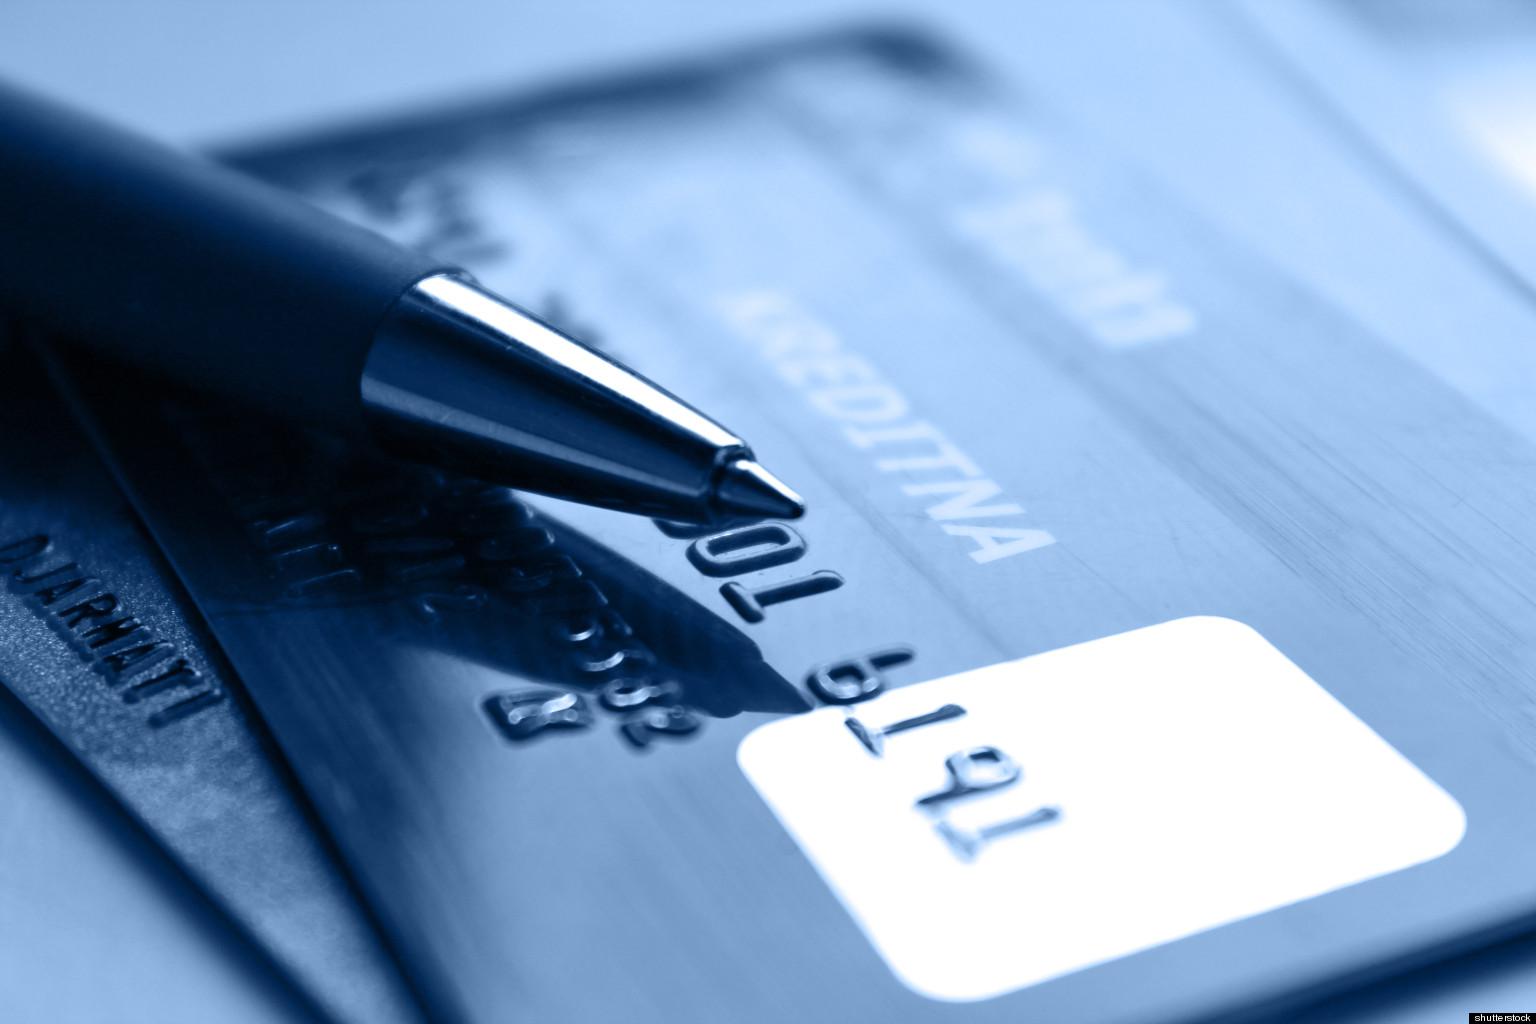 CAIXA disponibiliza R$ 7 bilhões para o Construcard